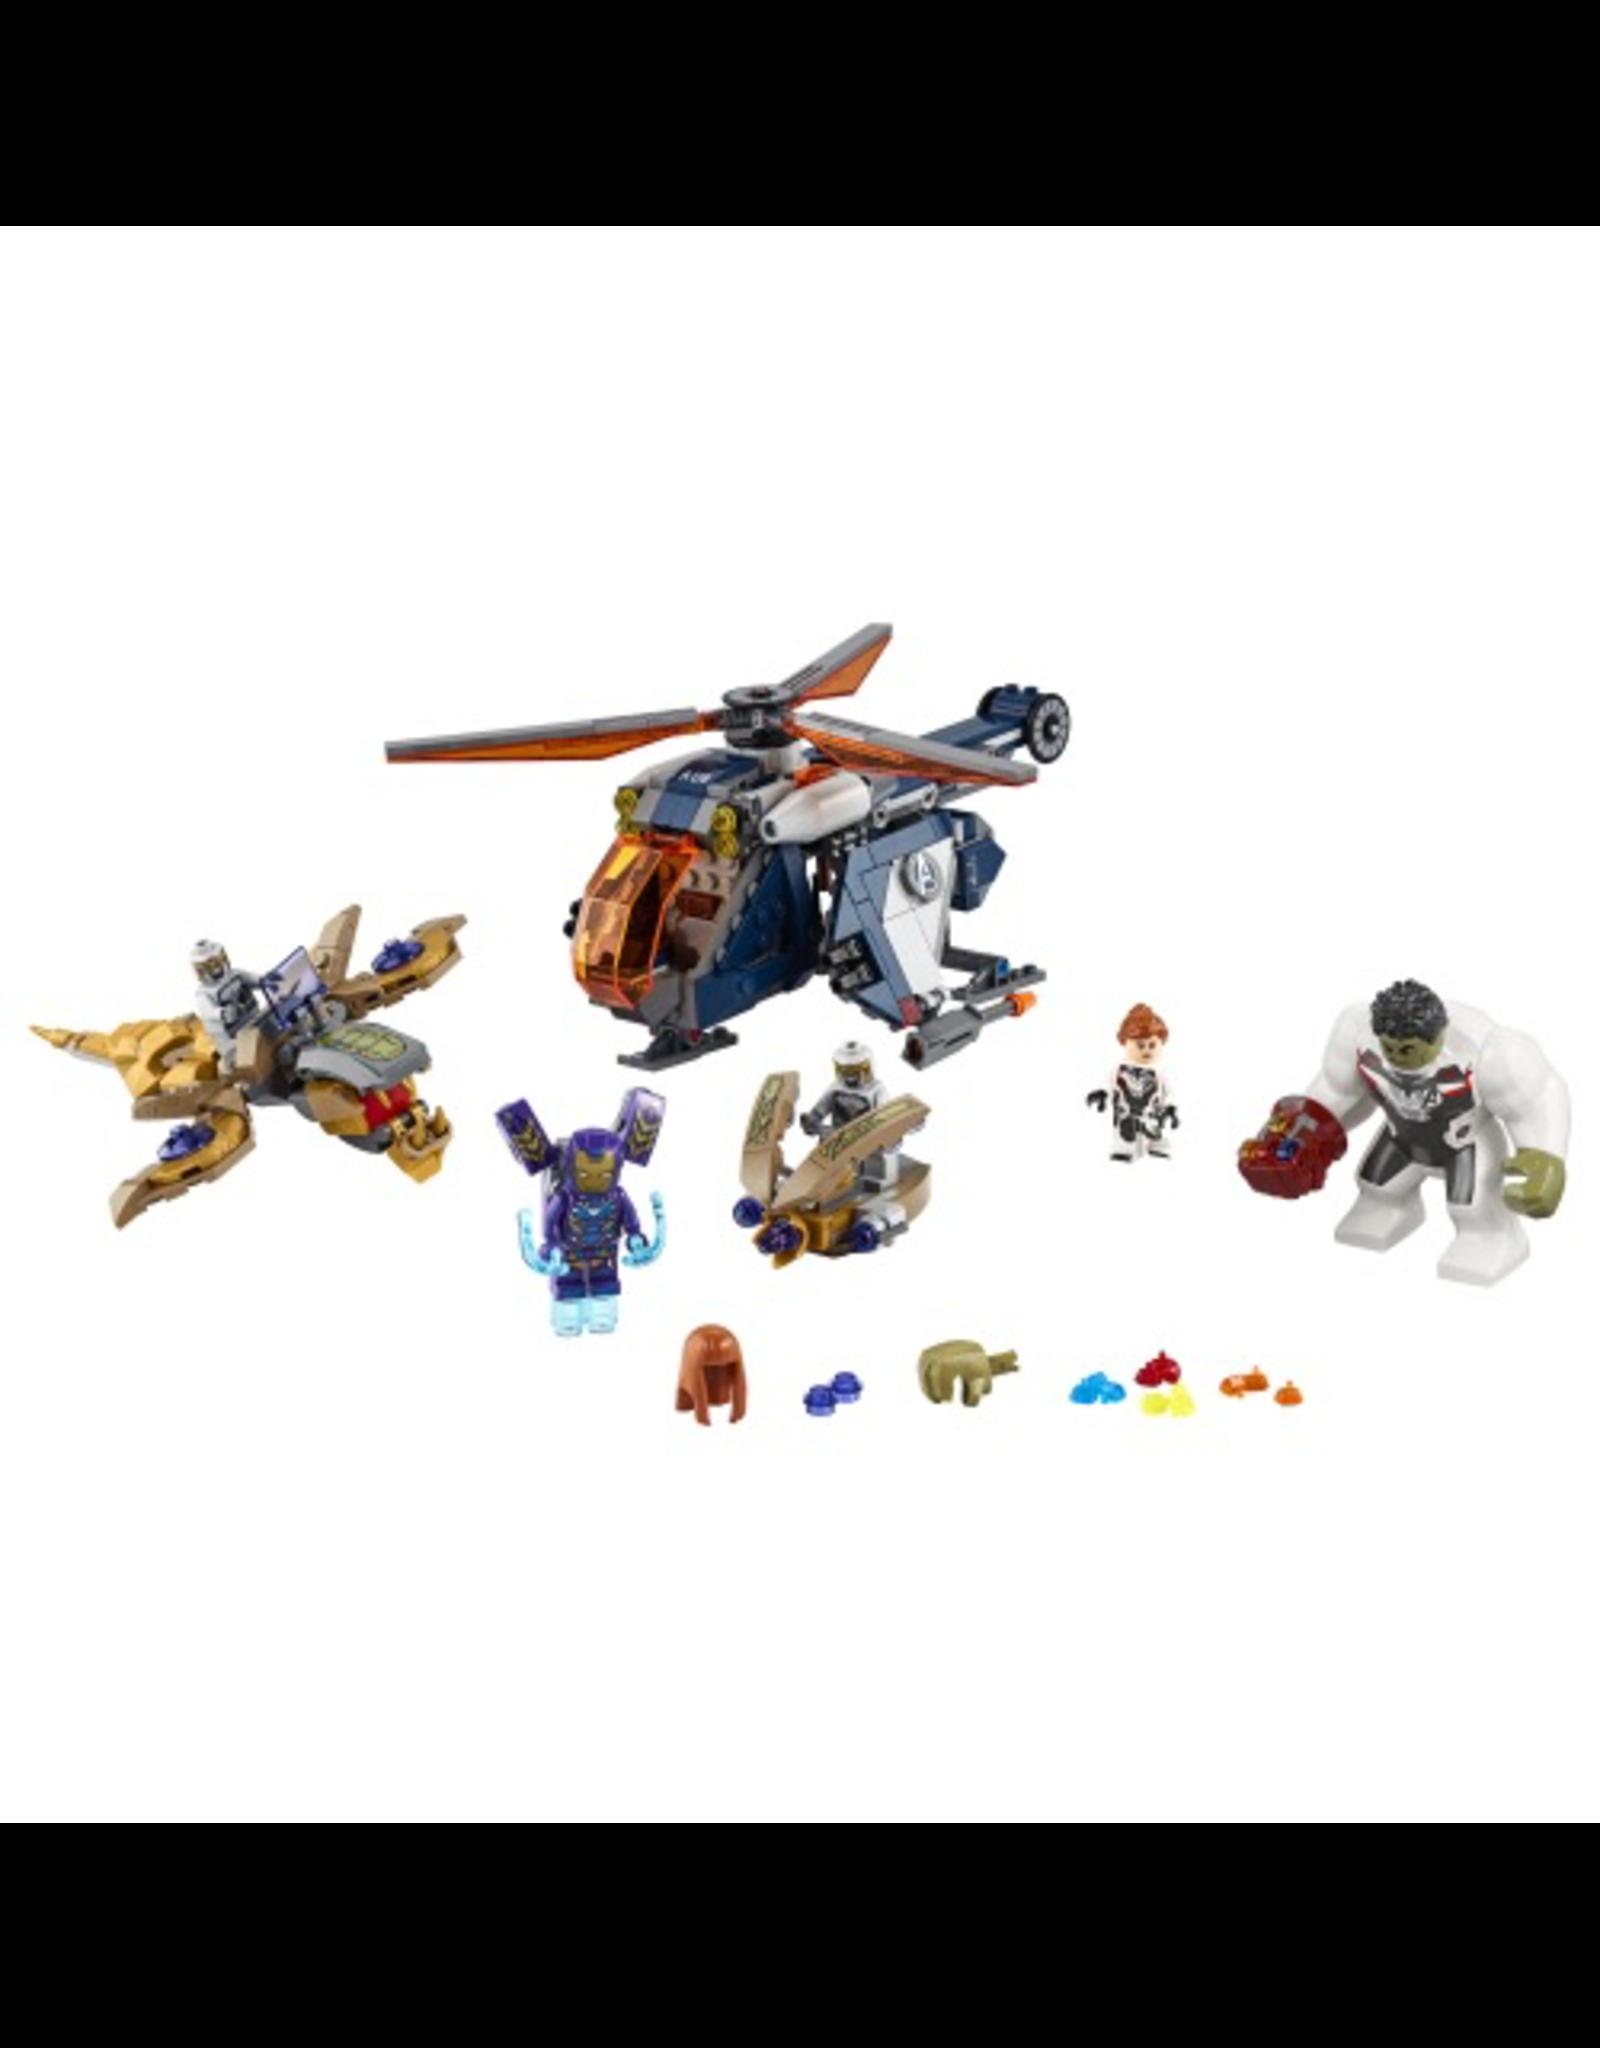 LEGO SUPER HEROES - 76144 - MARVEL - AVENGERS HULK HELICOPTER RESCUE